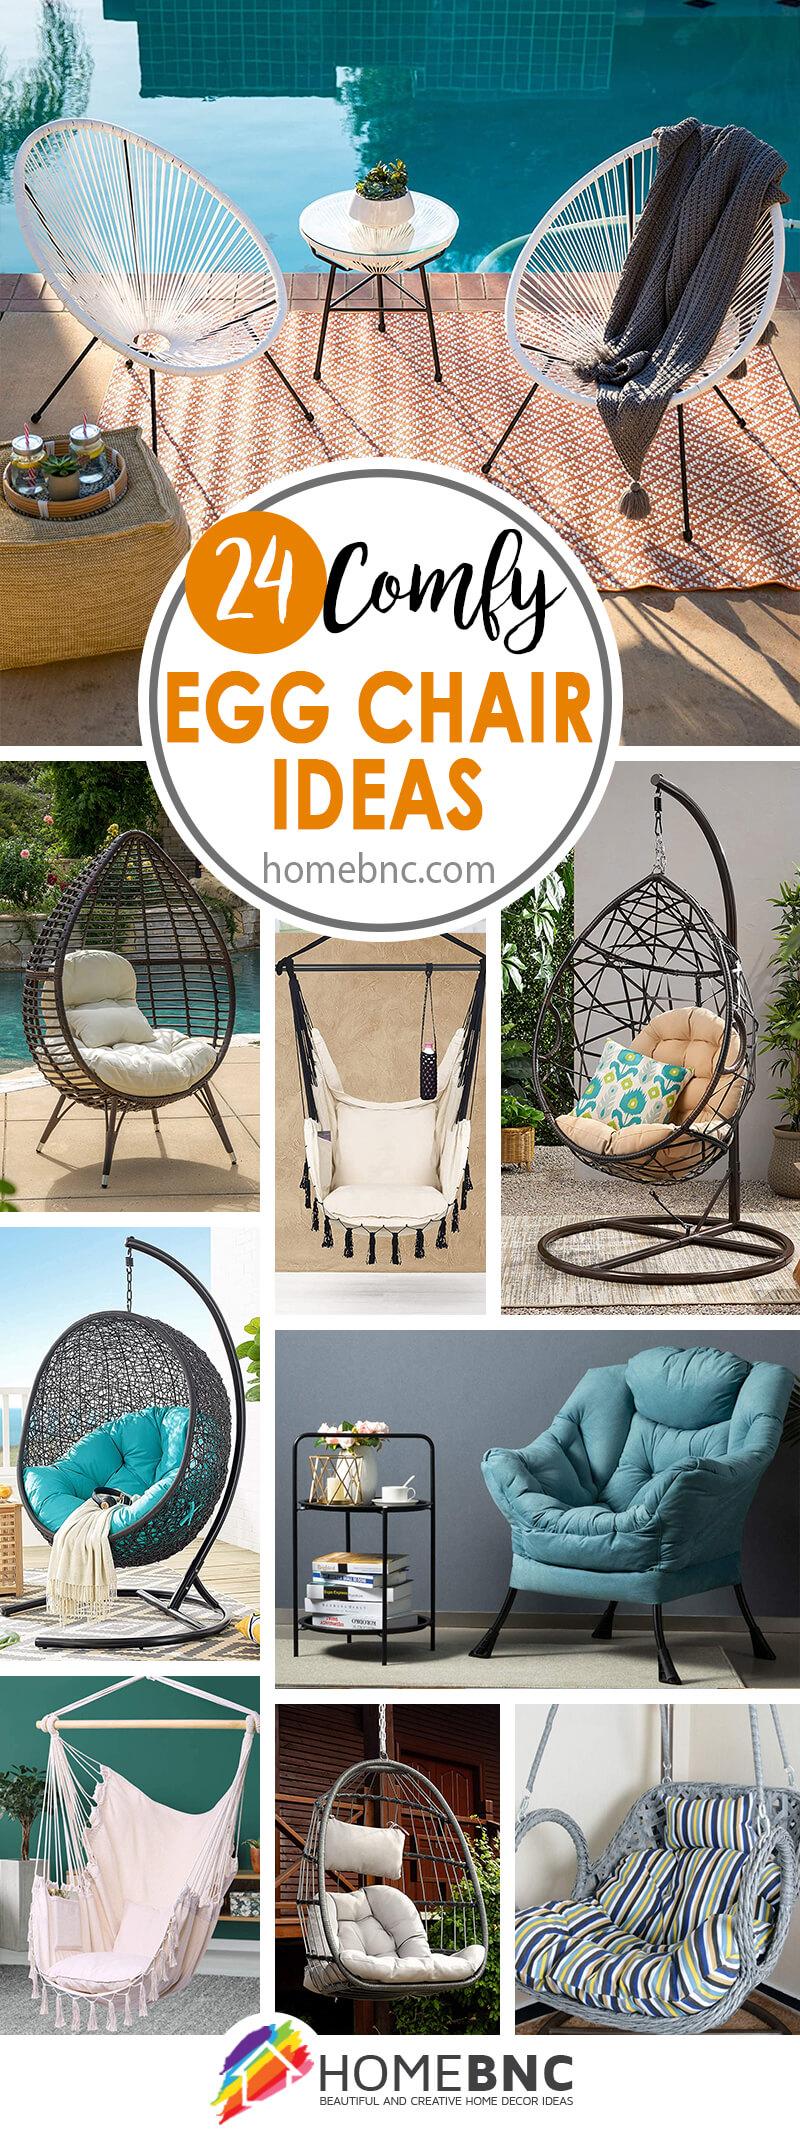 Best Egg Chair